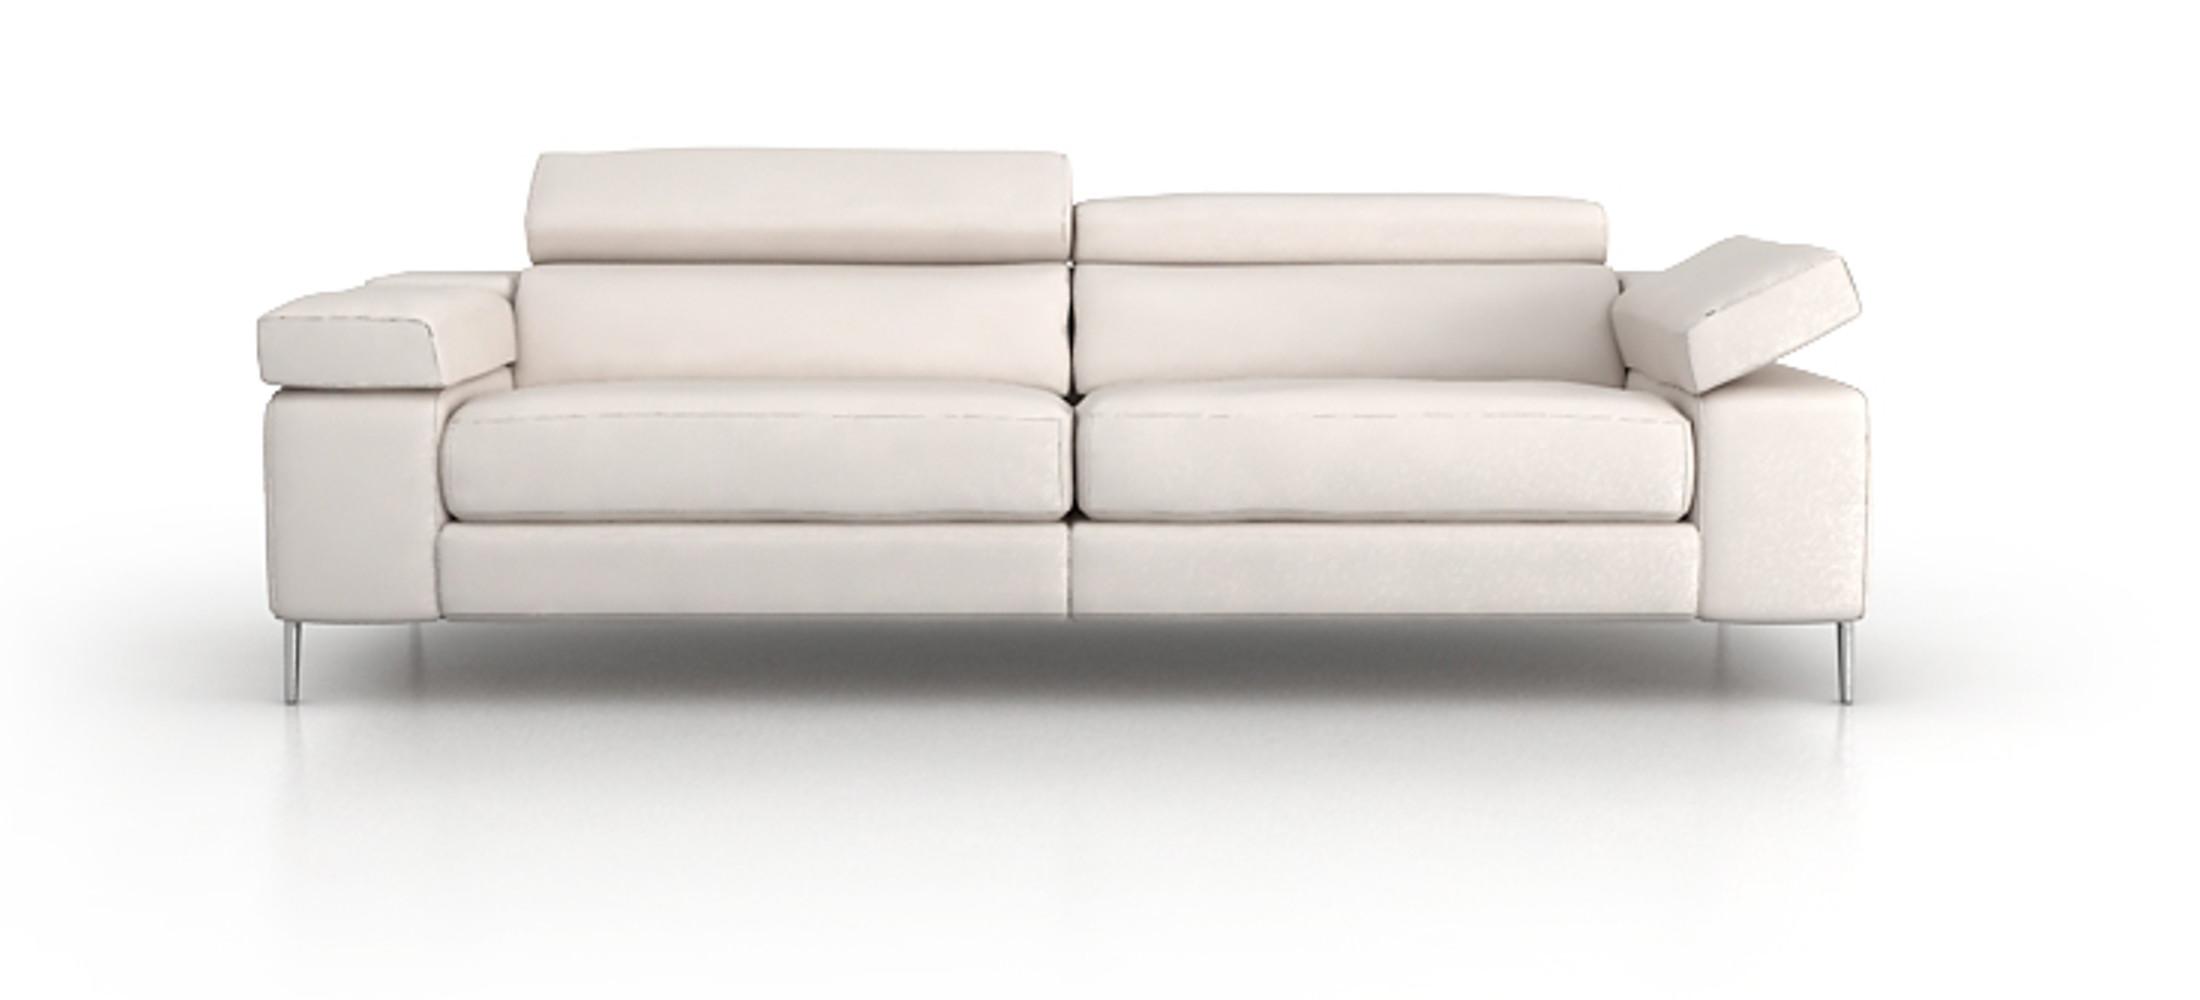 comprar sofa online